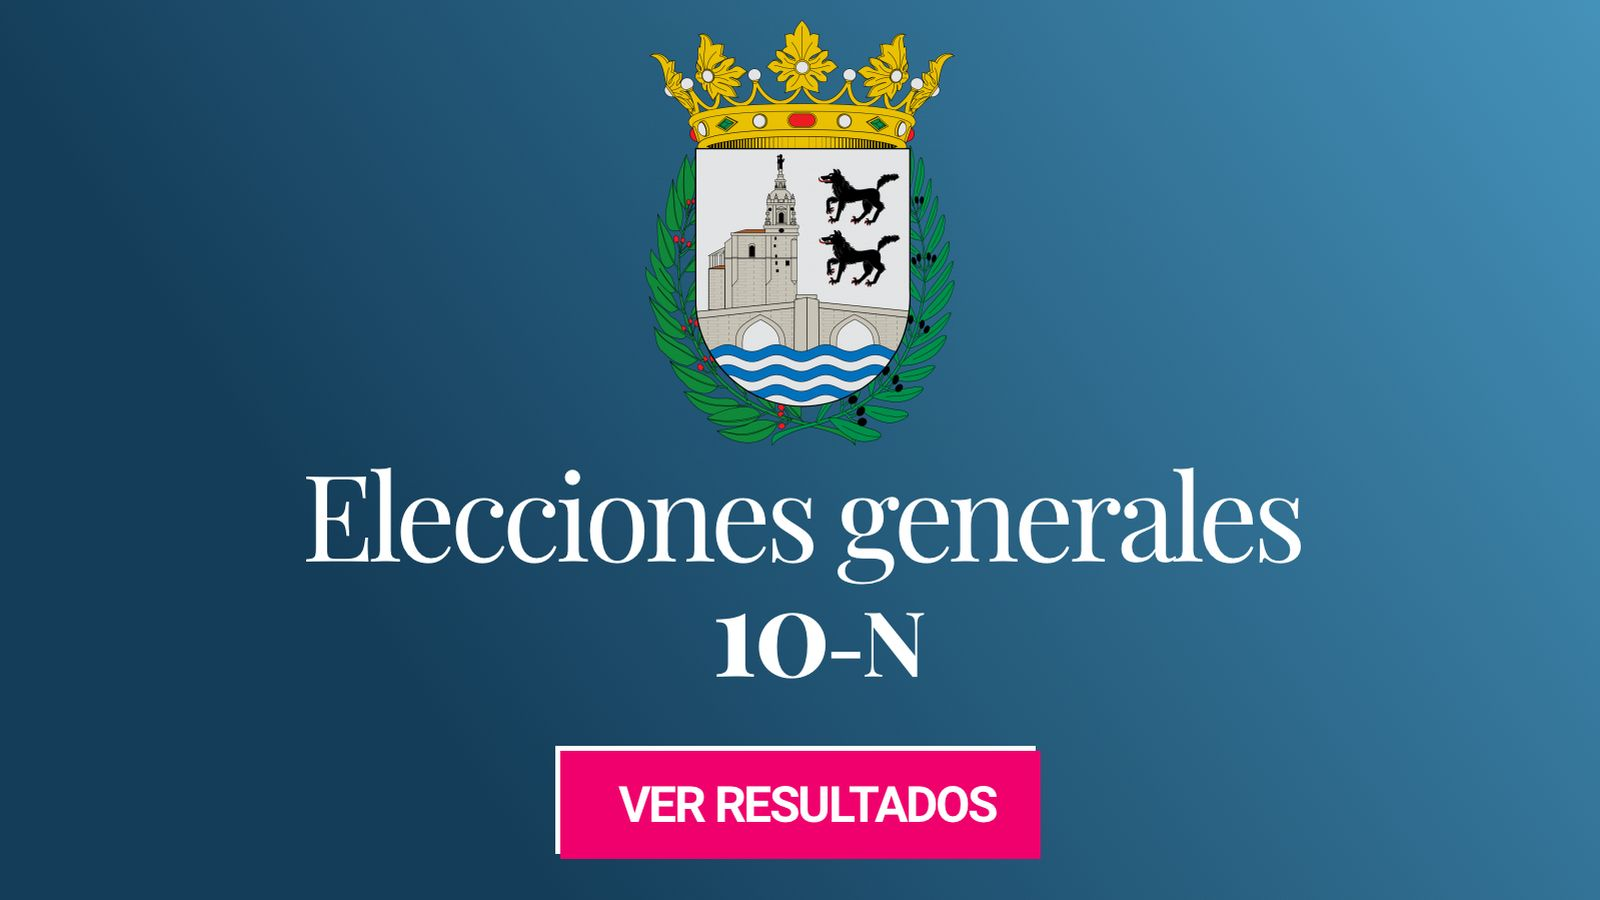 Foto: Elecciones generales 2019 en Bilbao. (C.C./EC)